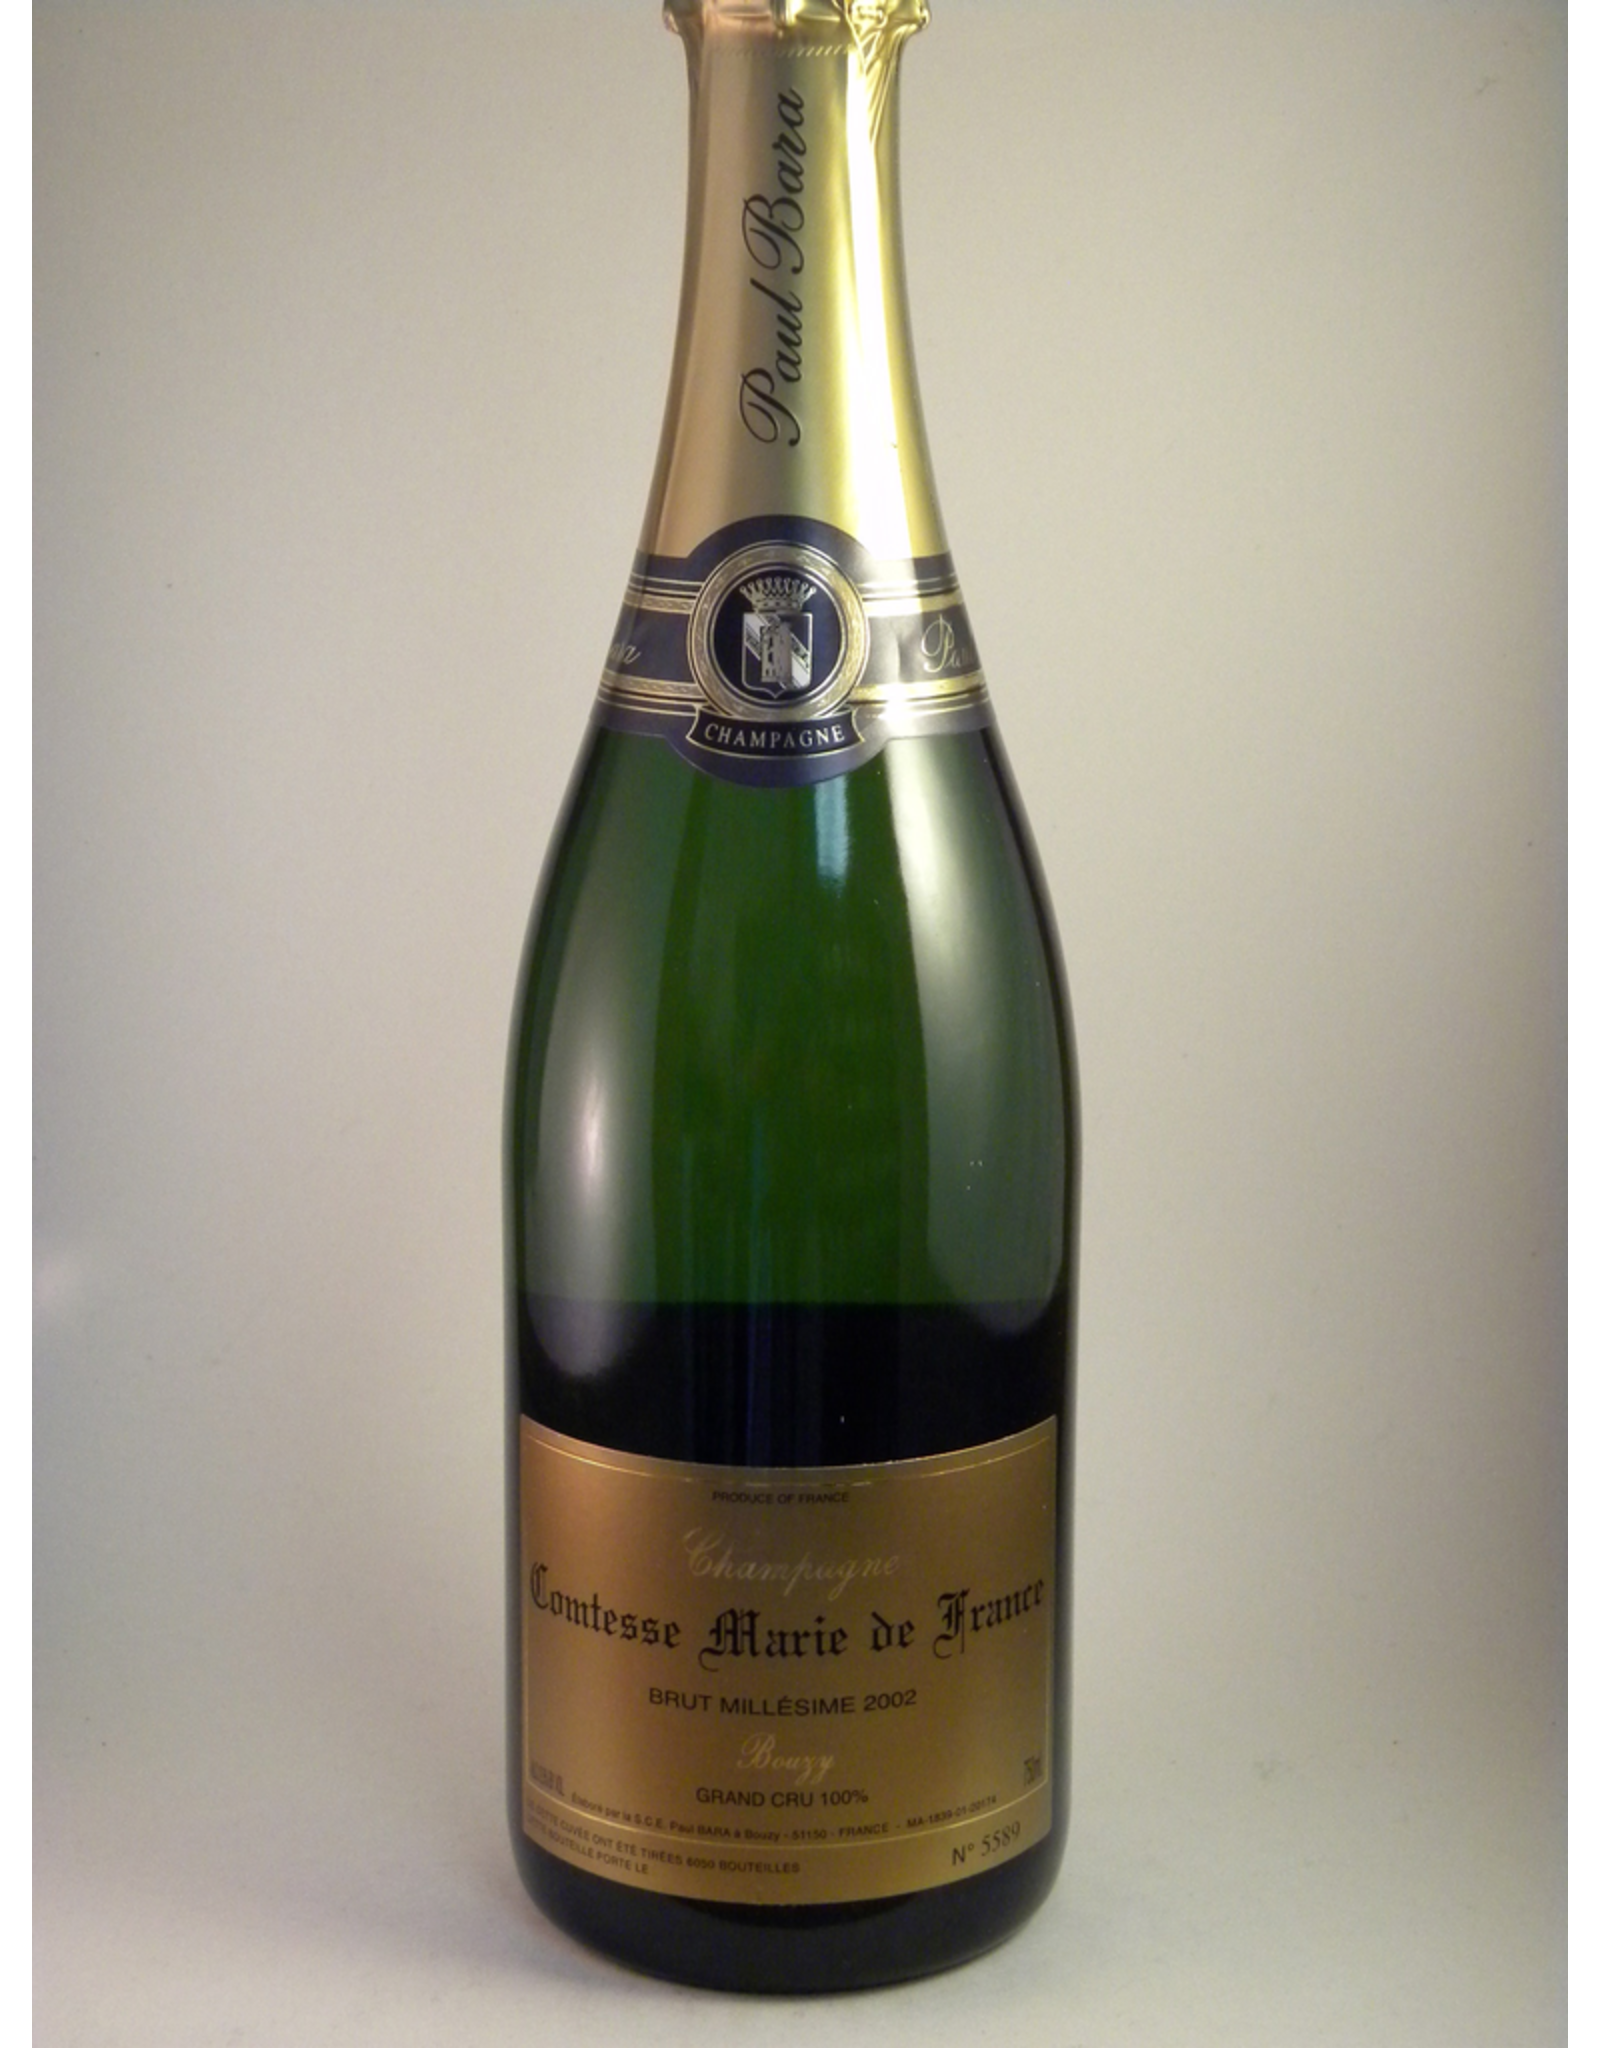 Paul Bara Champagne Comtesse Marie de France 2006